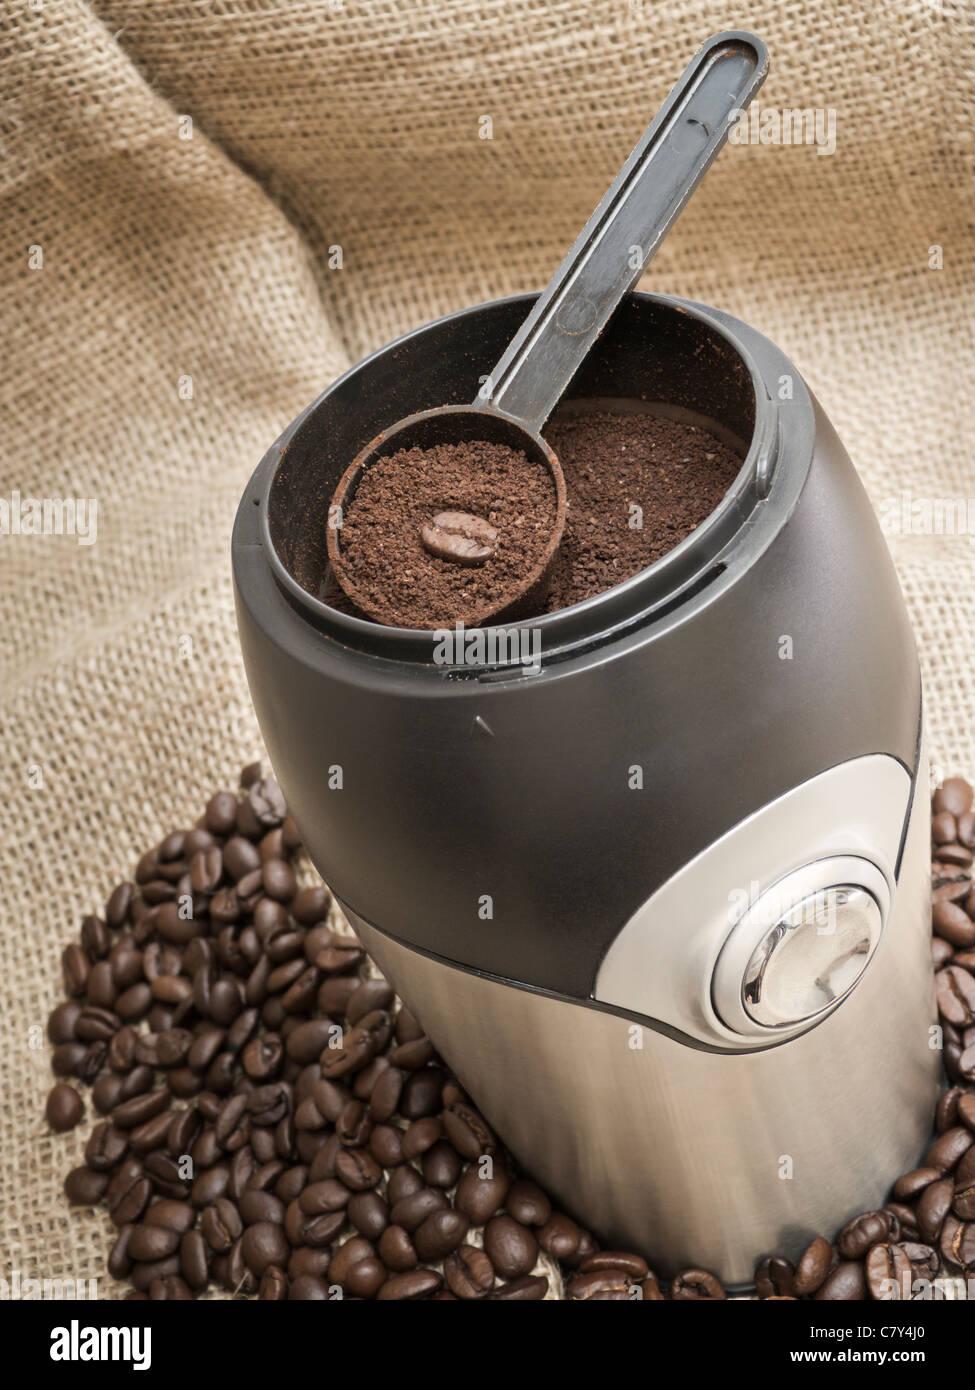 Ground Coffee - Stock Image